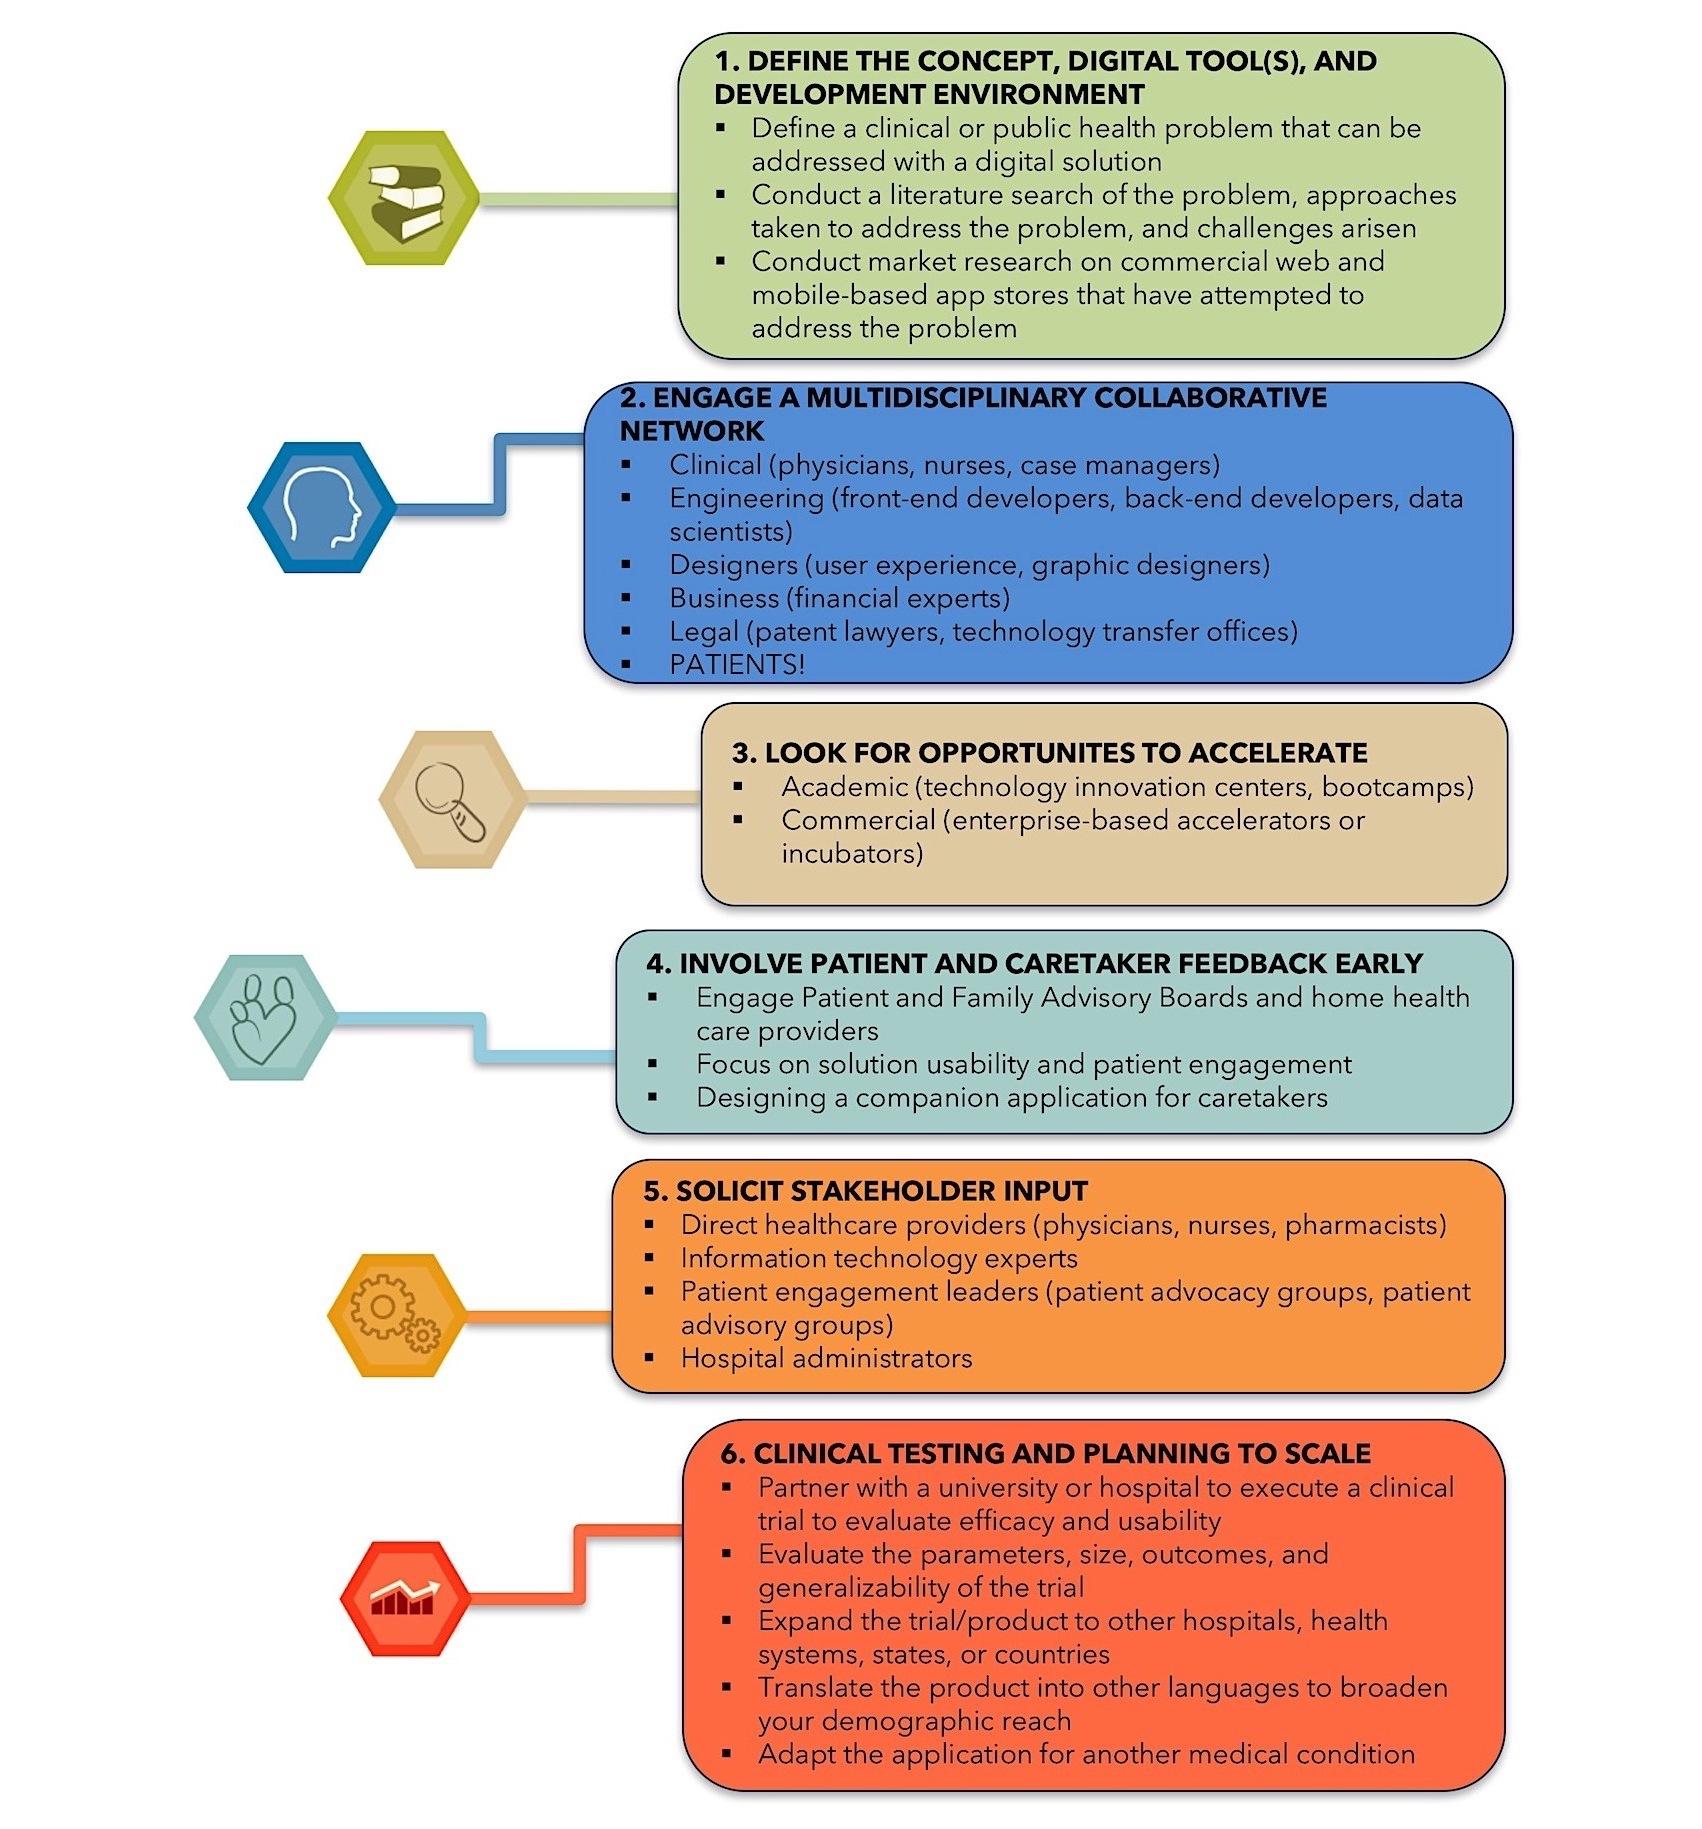 JCARD - Digital Health Innovation: A Toolkit to Navigate